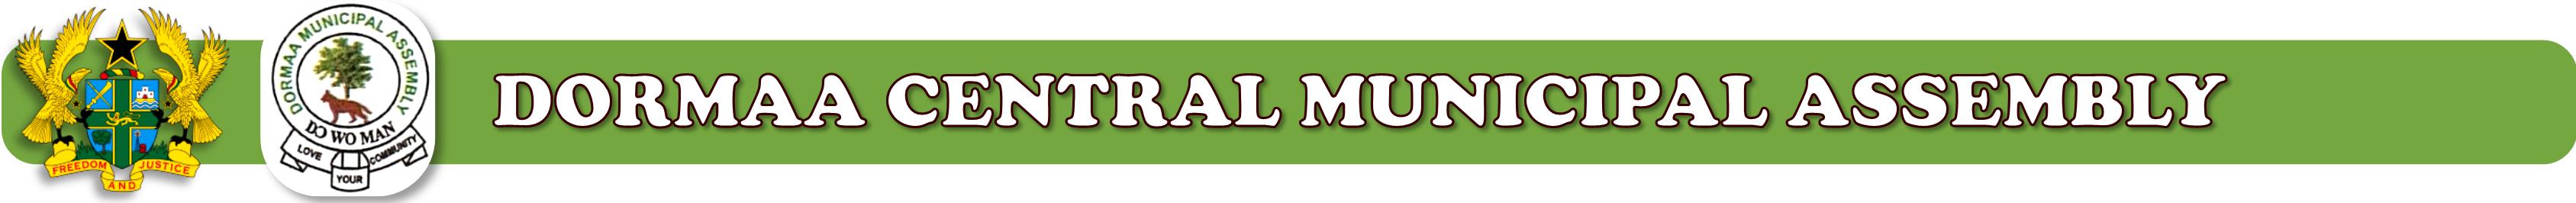 Dormaa Central Municipal Assembly Logo